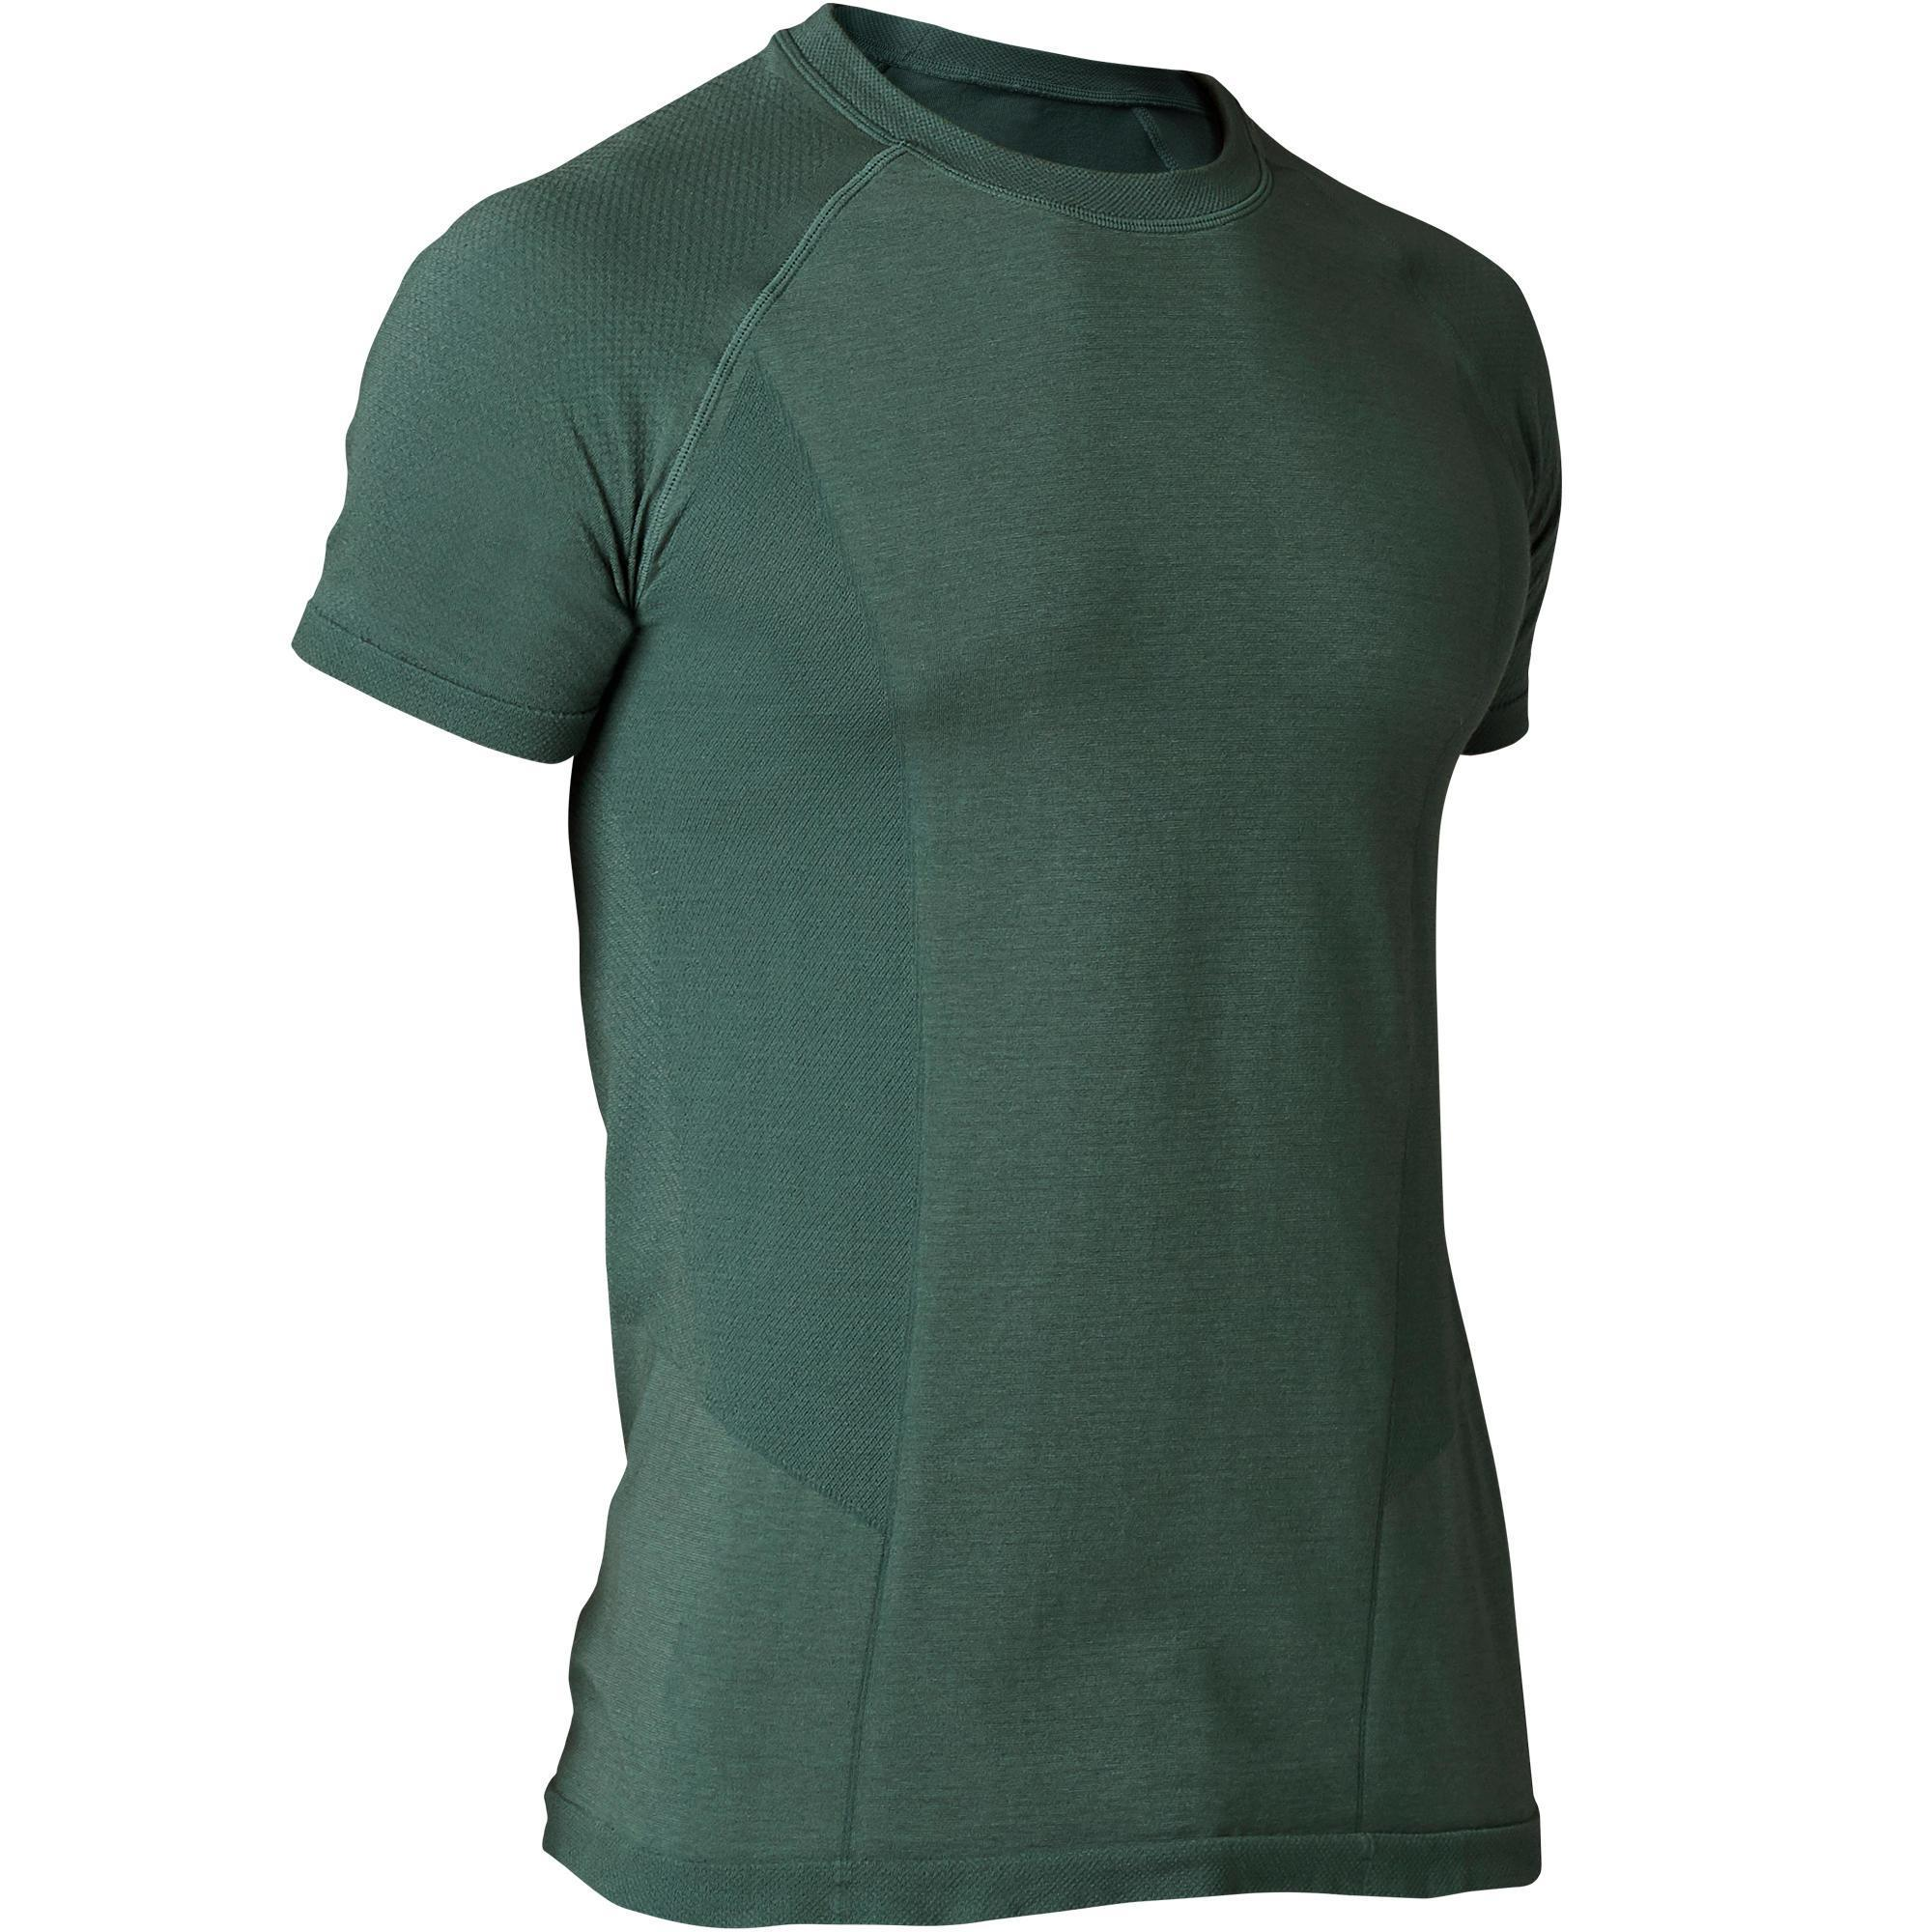 1defdf896f3 Vêtements de yoga homme